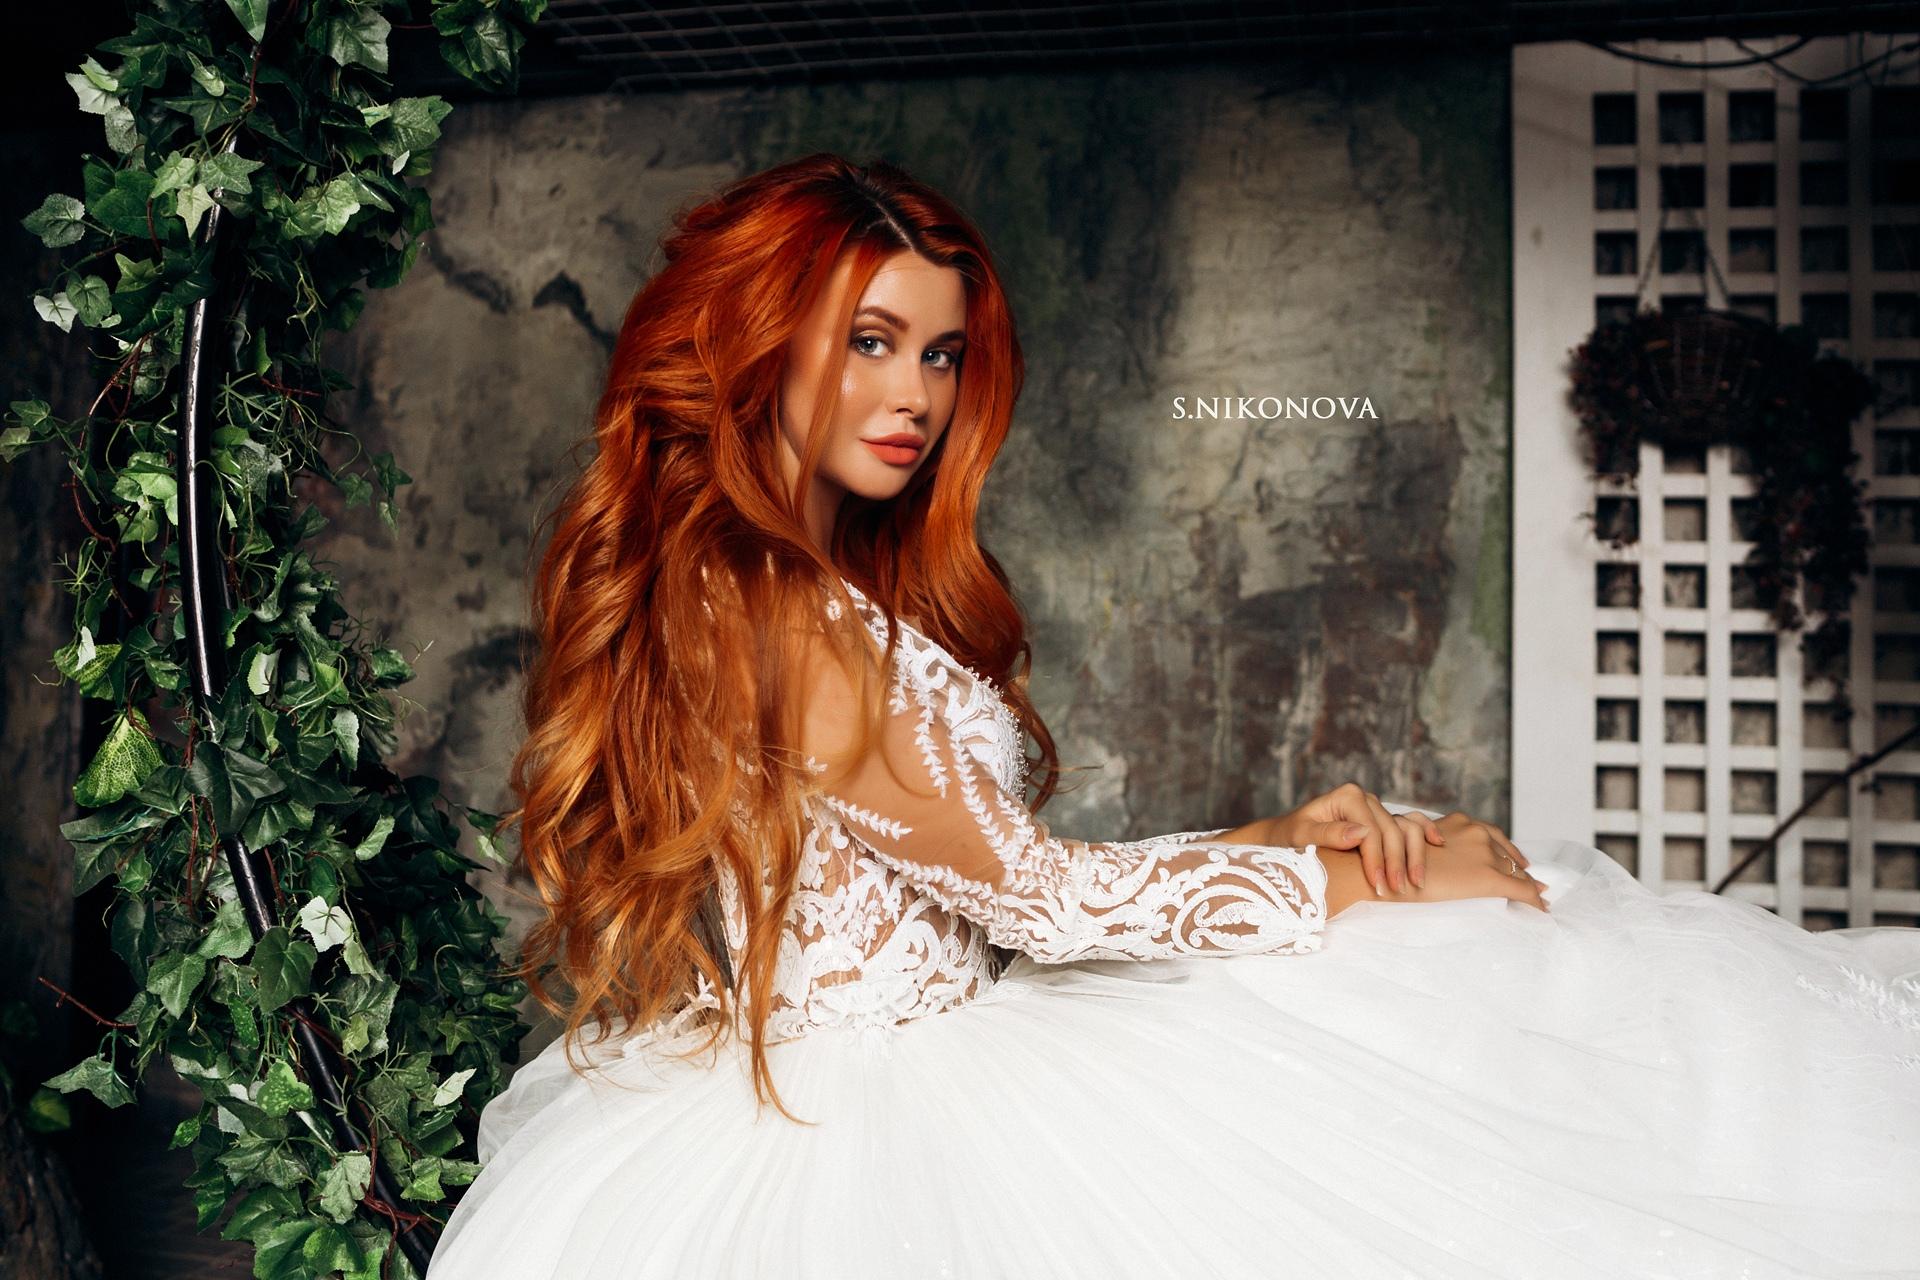 People 1920x1280 Dana Bounty women model redhead portrait wedding dress white dress indoors looking at viewer women indoors Svetlana Nikonova long hair